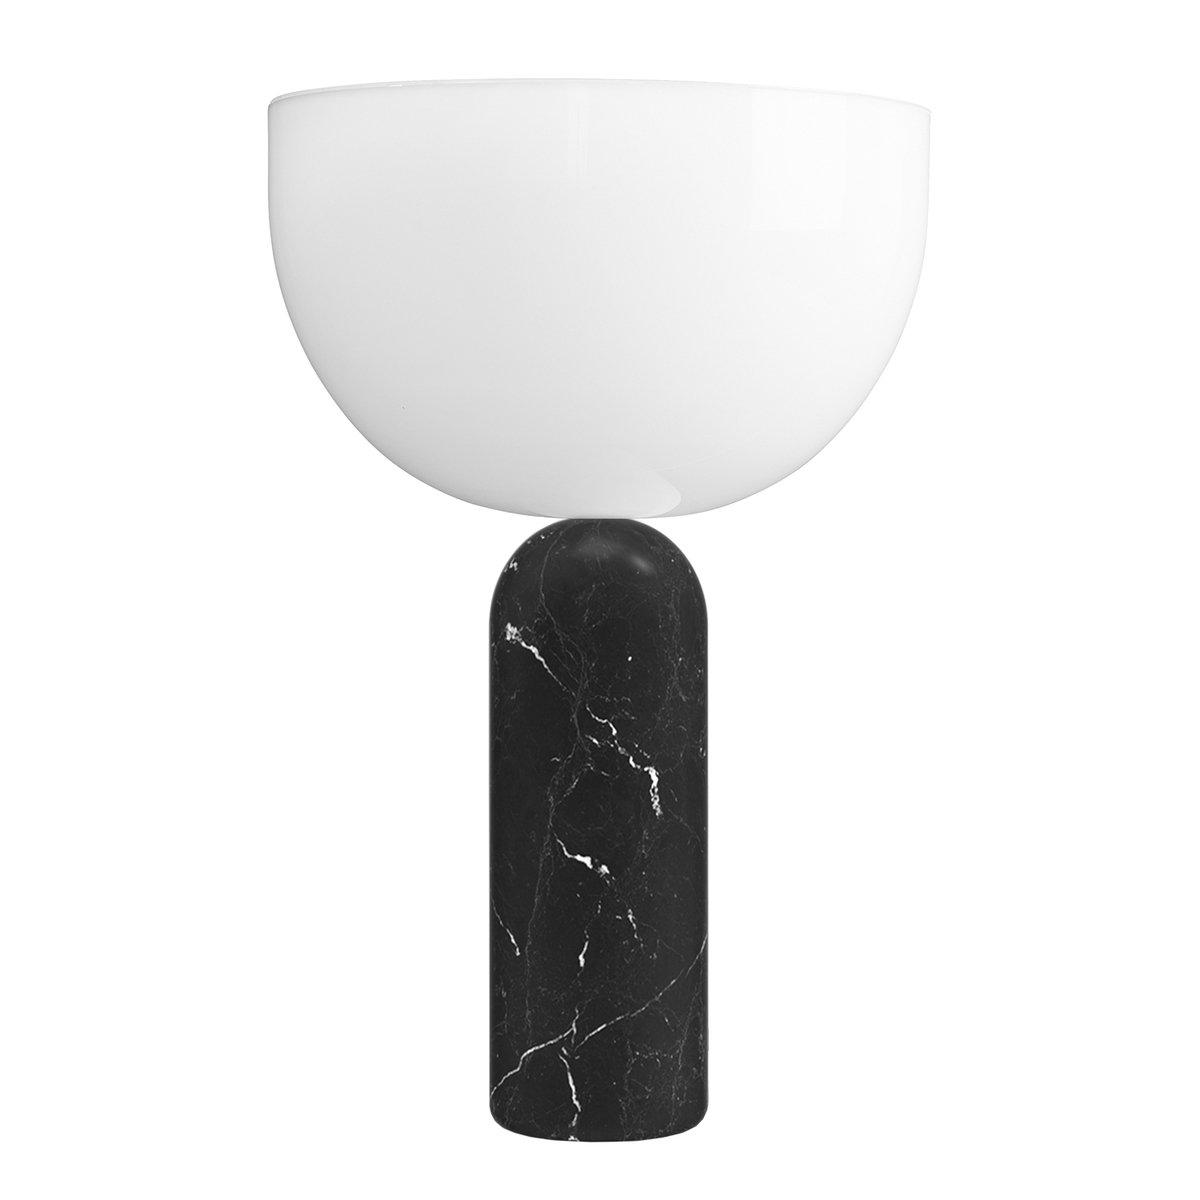 New Works Kizu Table Lamp Small Black Marble Finnish